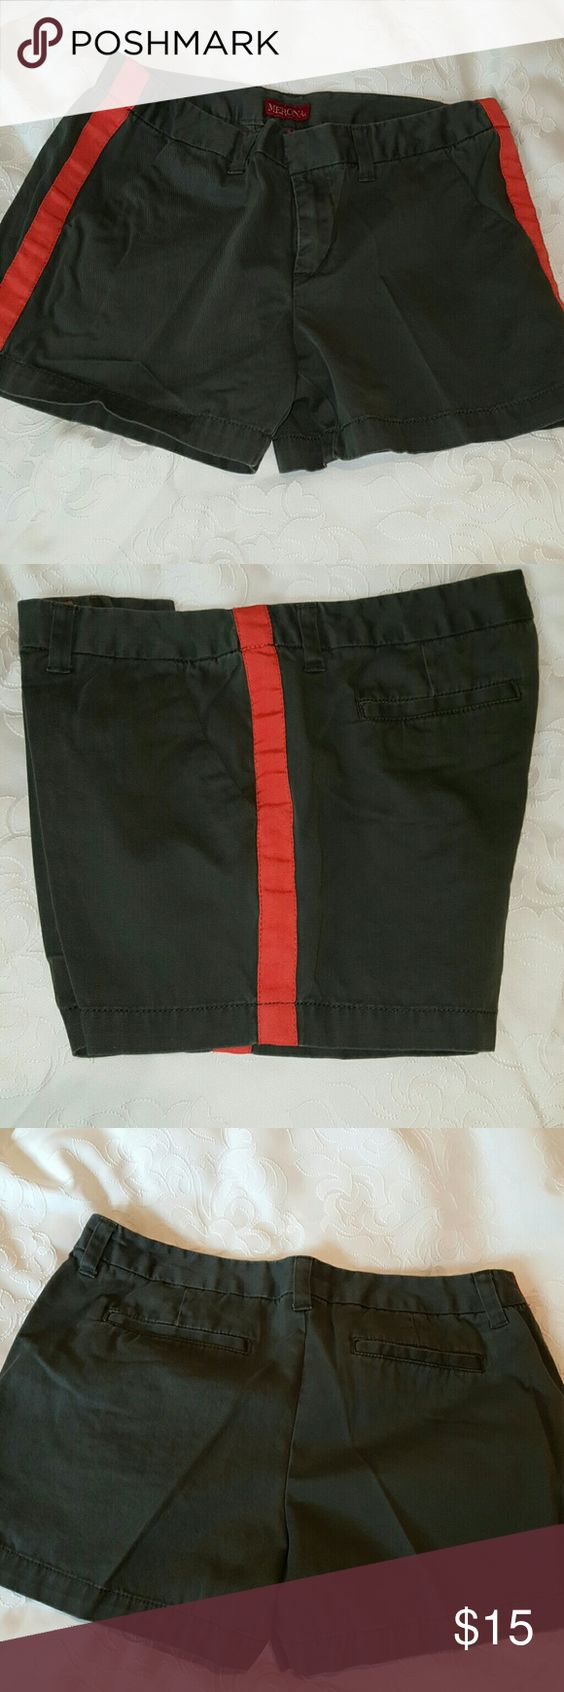 Merona shorts Never worn.   Very unique.  They are khaki and orange. Merona Shorts